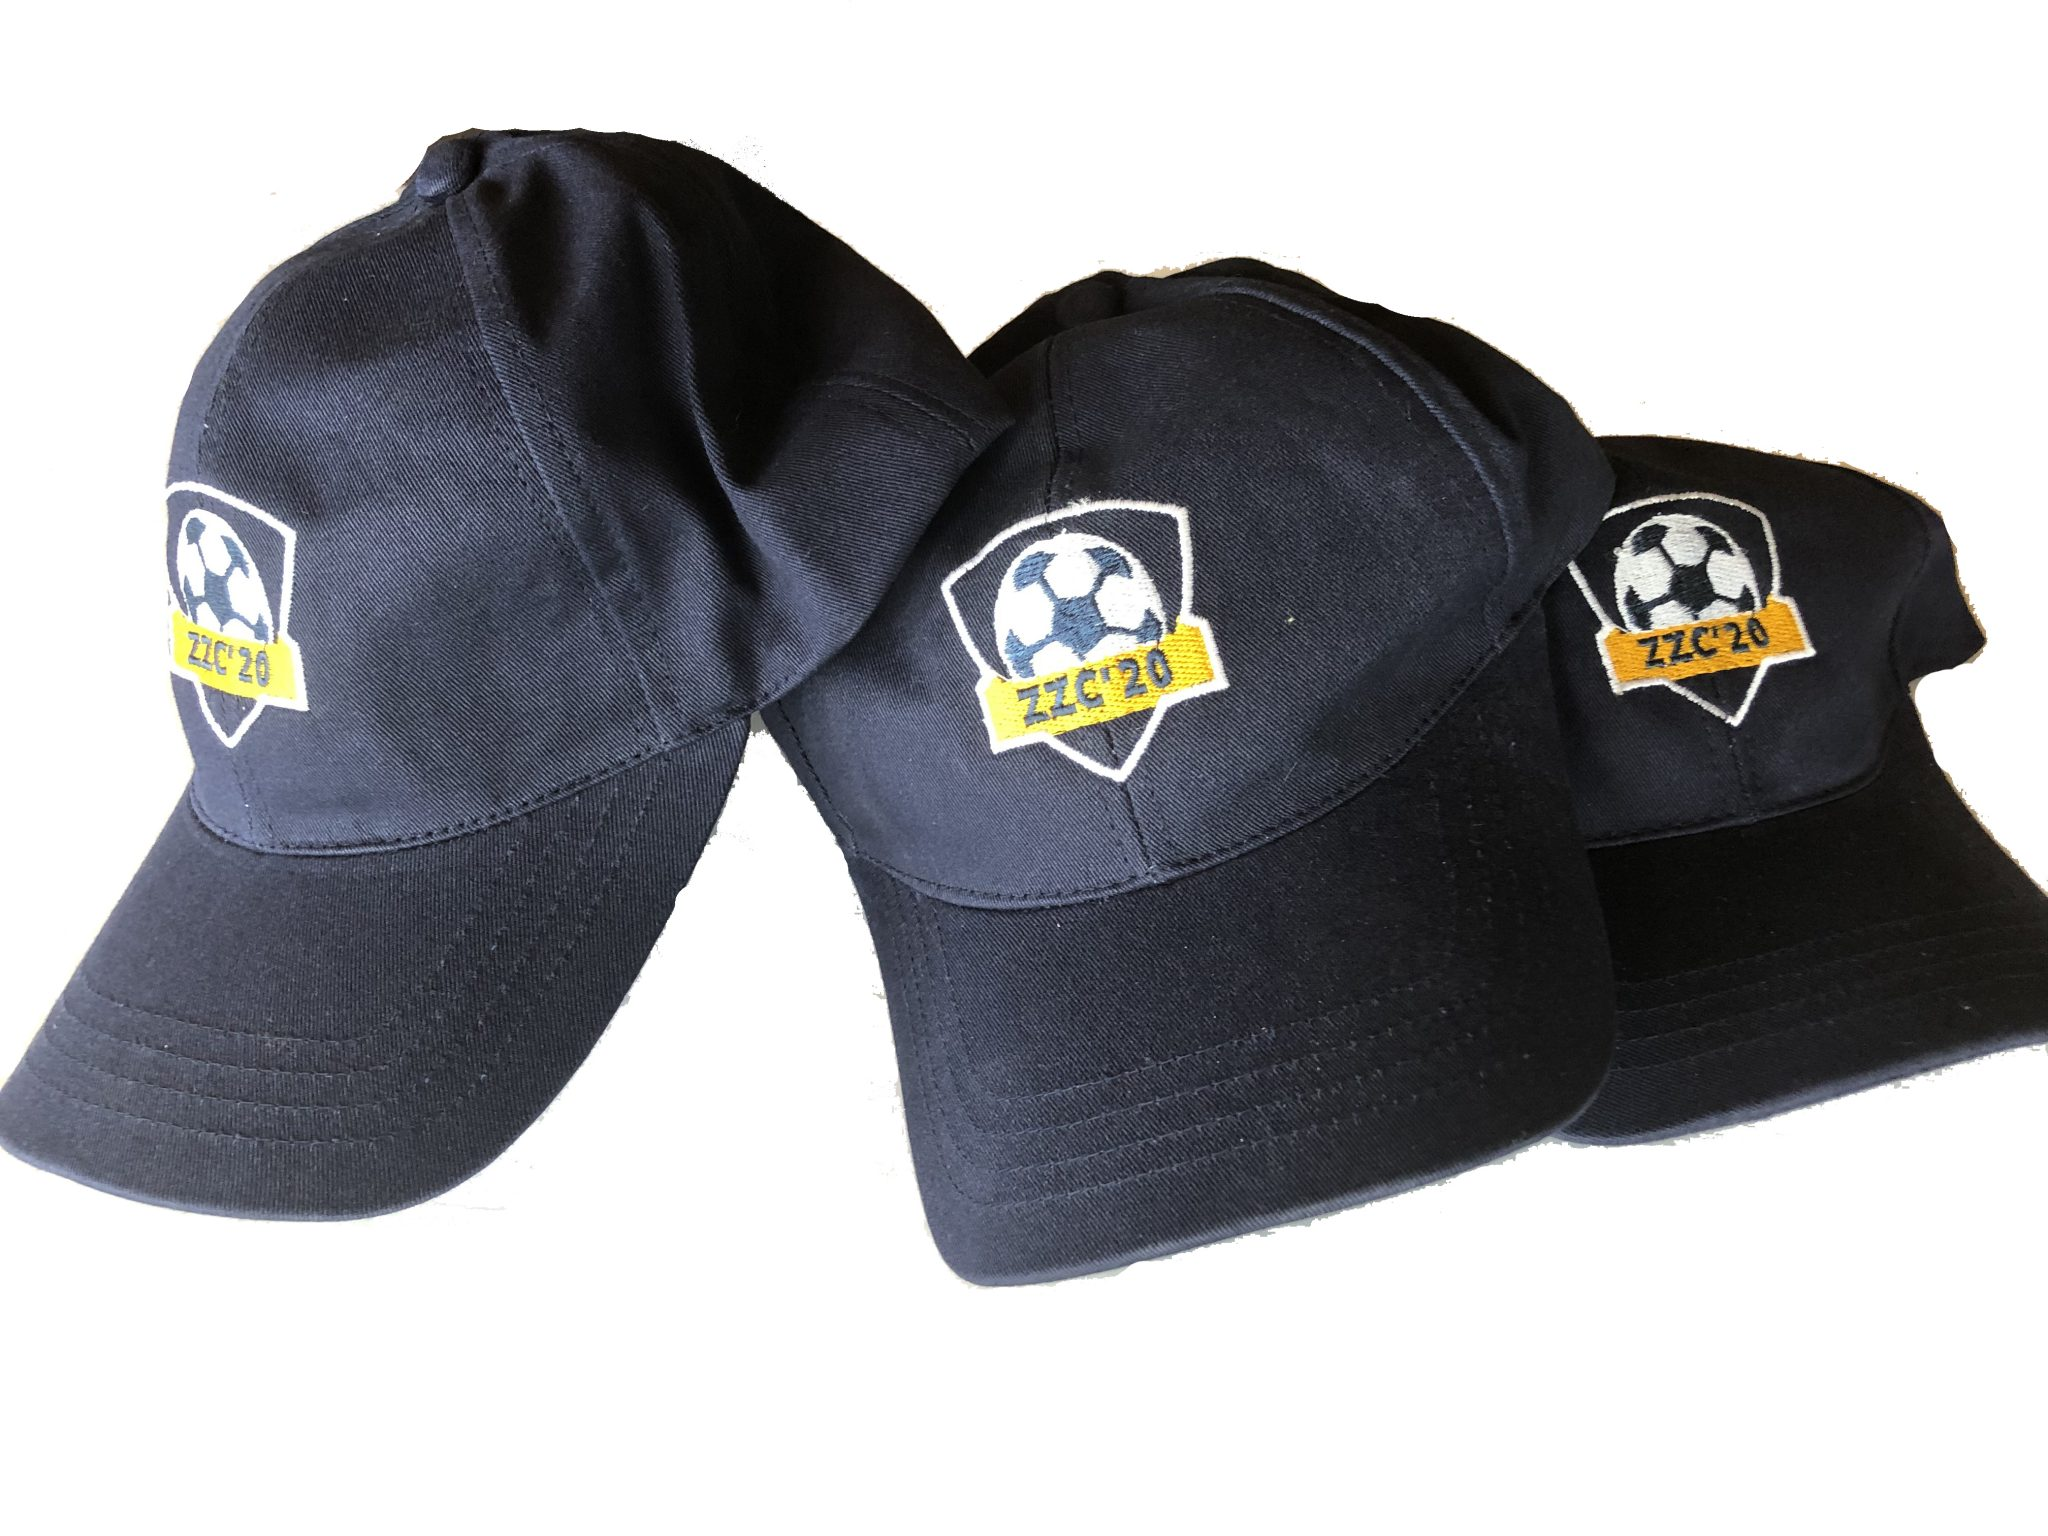 Merchandise ZZC'20